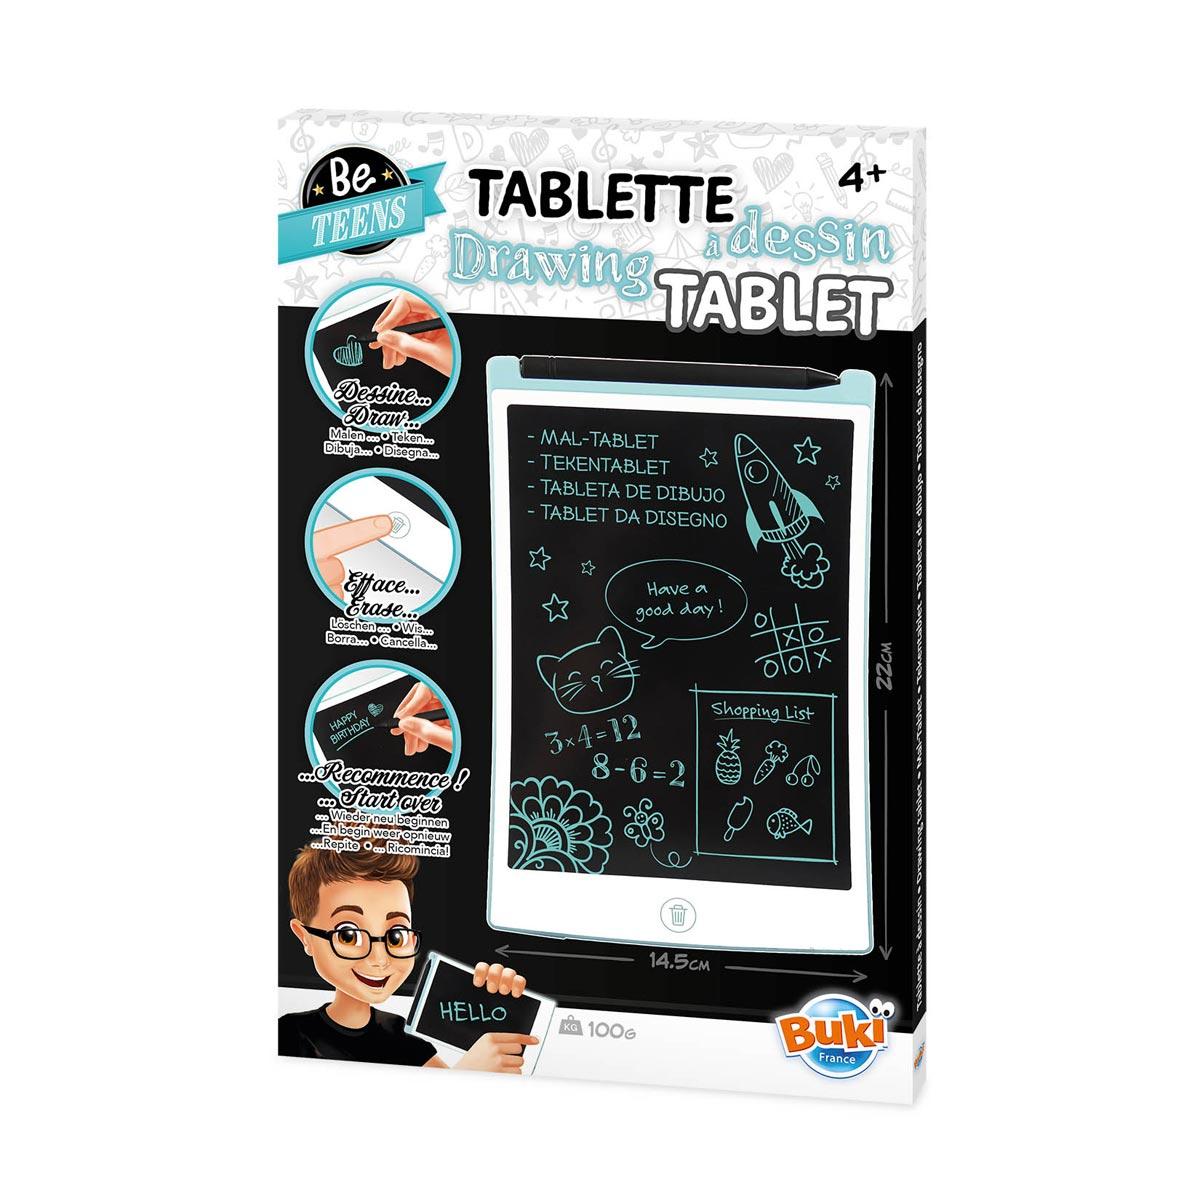 Ardoise tablette de dessin LCD